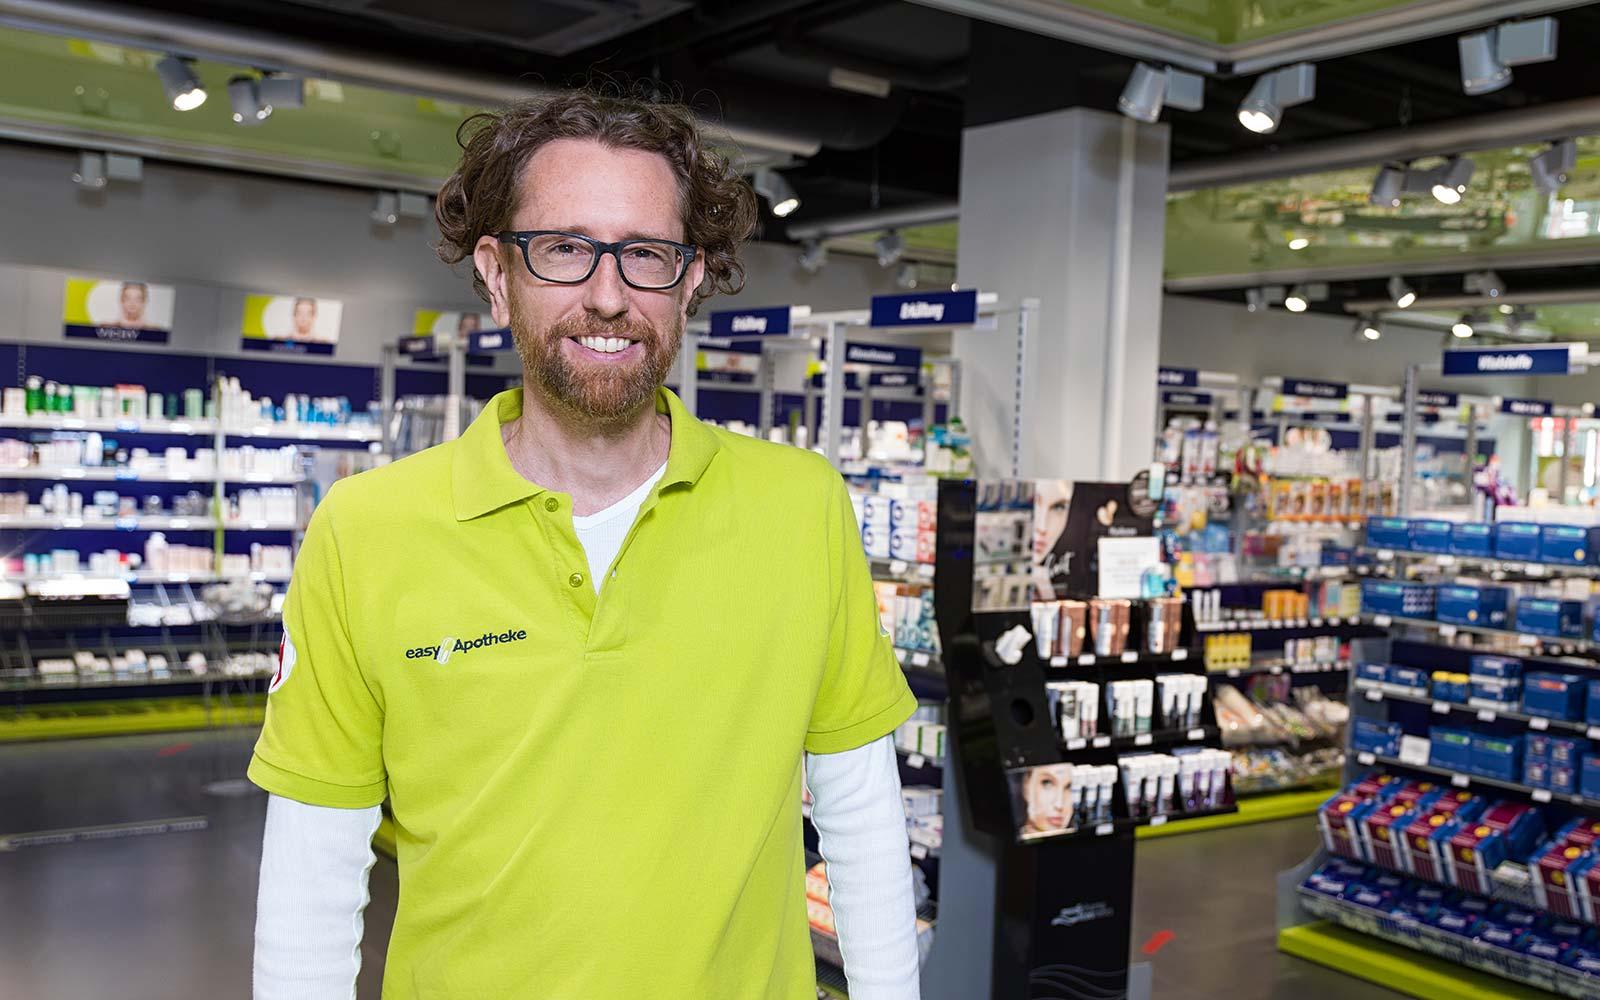 Apotheker Dr. Christoph Gehrke in seiner easyApotheke in Mutterstadt